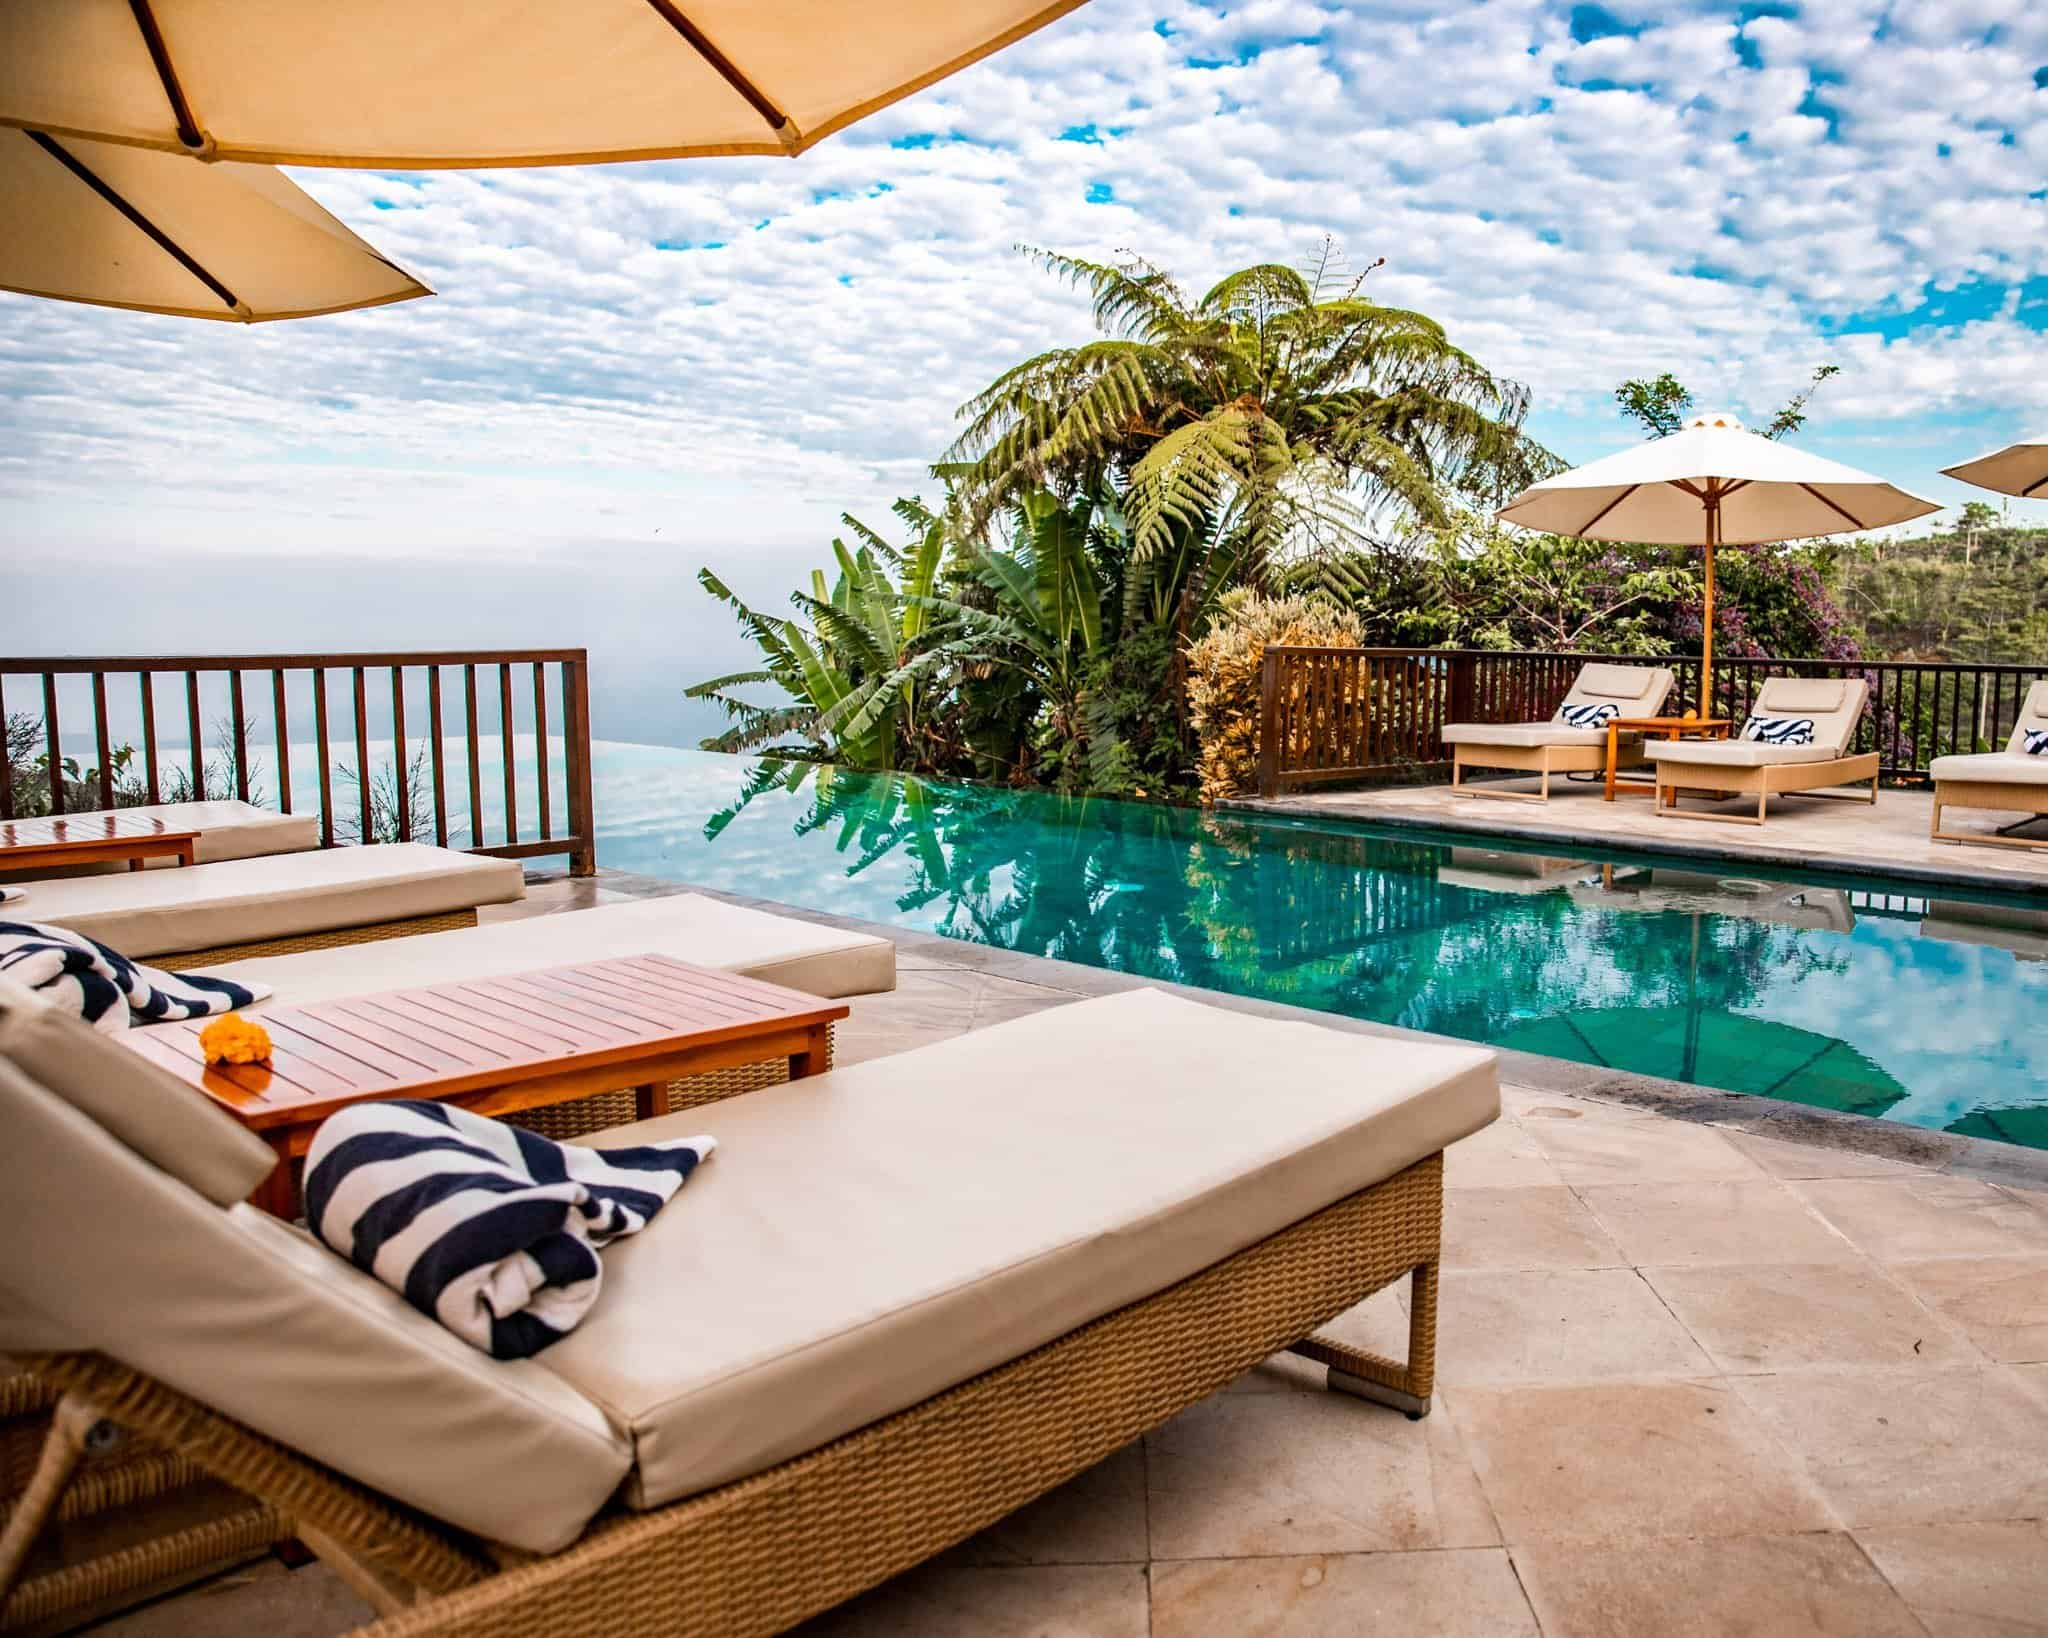 Pool Area at Munduk Moding Plantation Bali - The Next Trip